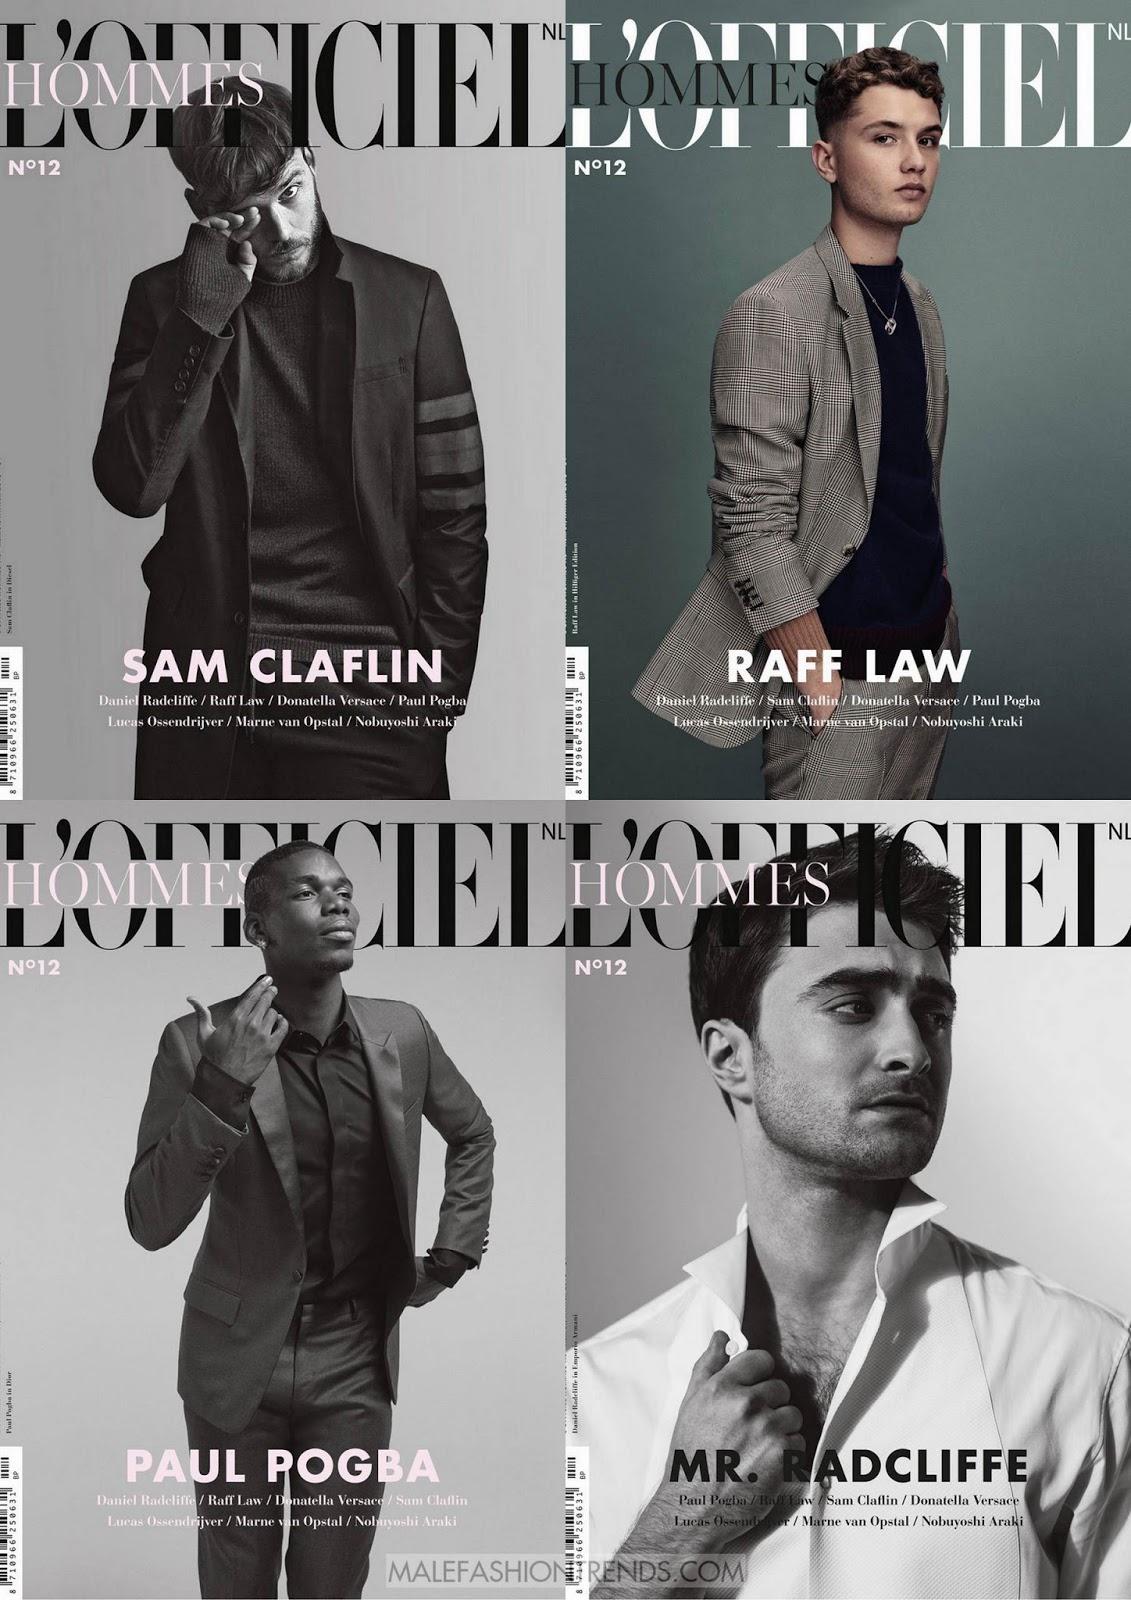 Paul Pogba, Daniel Radcliffe, Raff Law y Sam Claflin para L'Officiel Hommes Nederlands